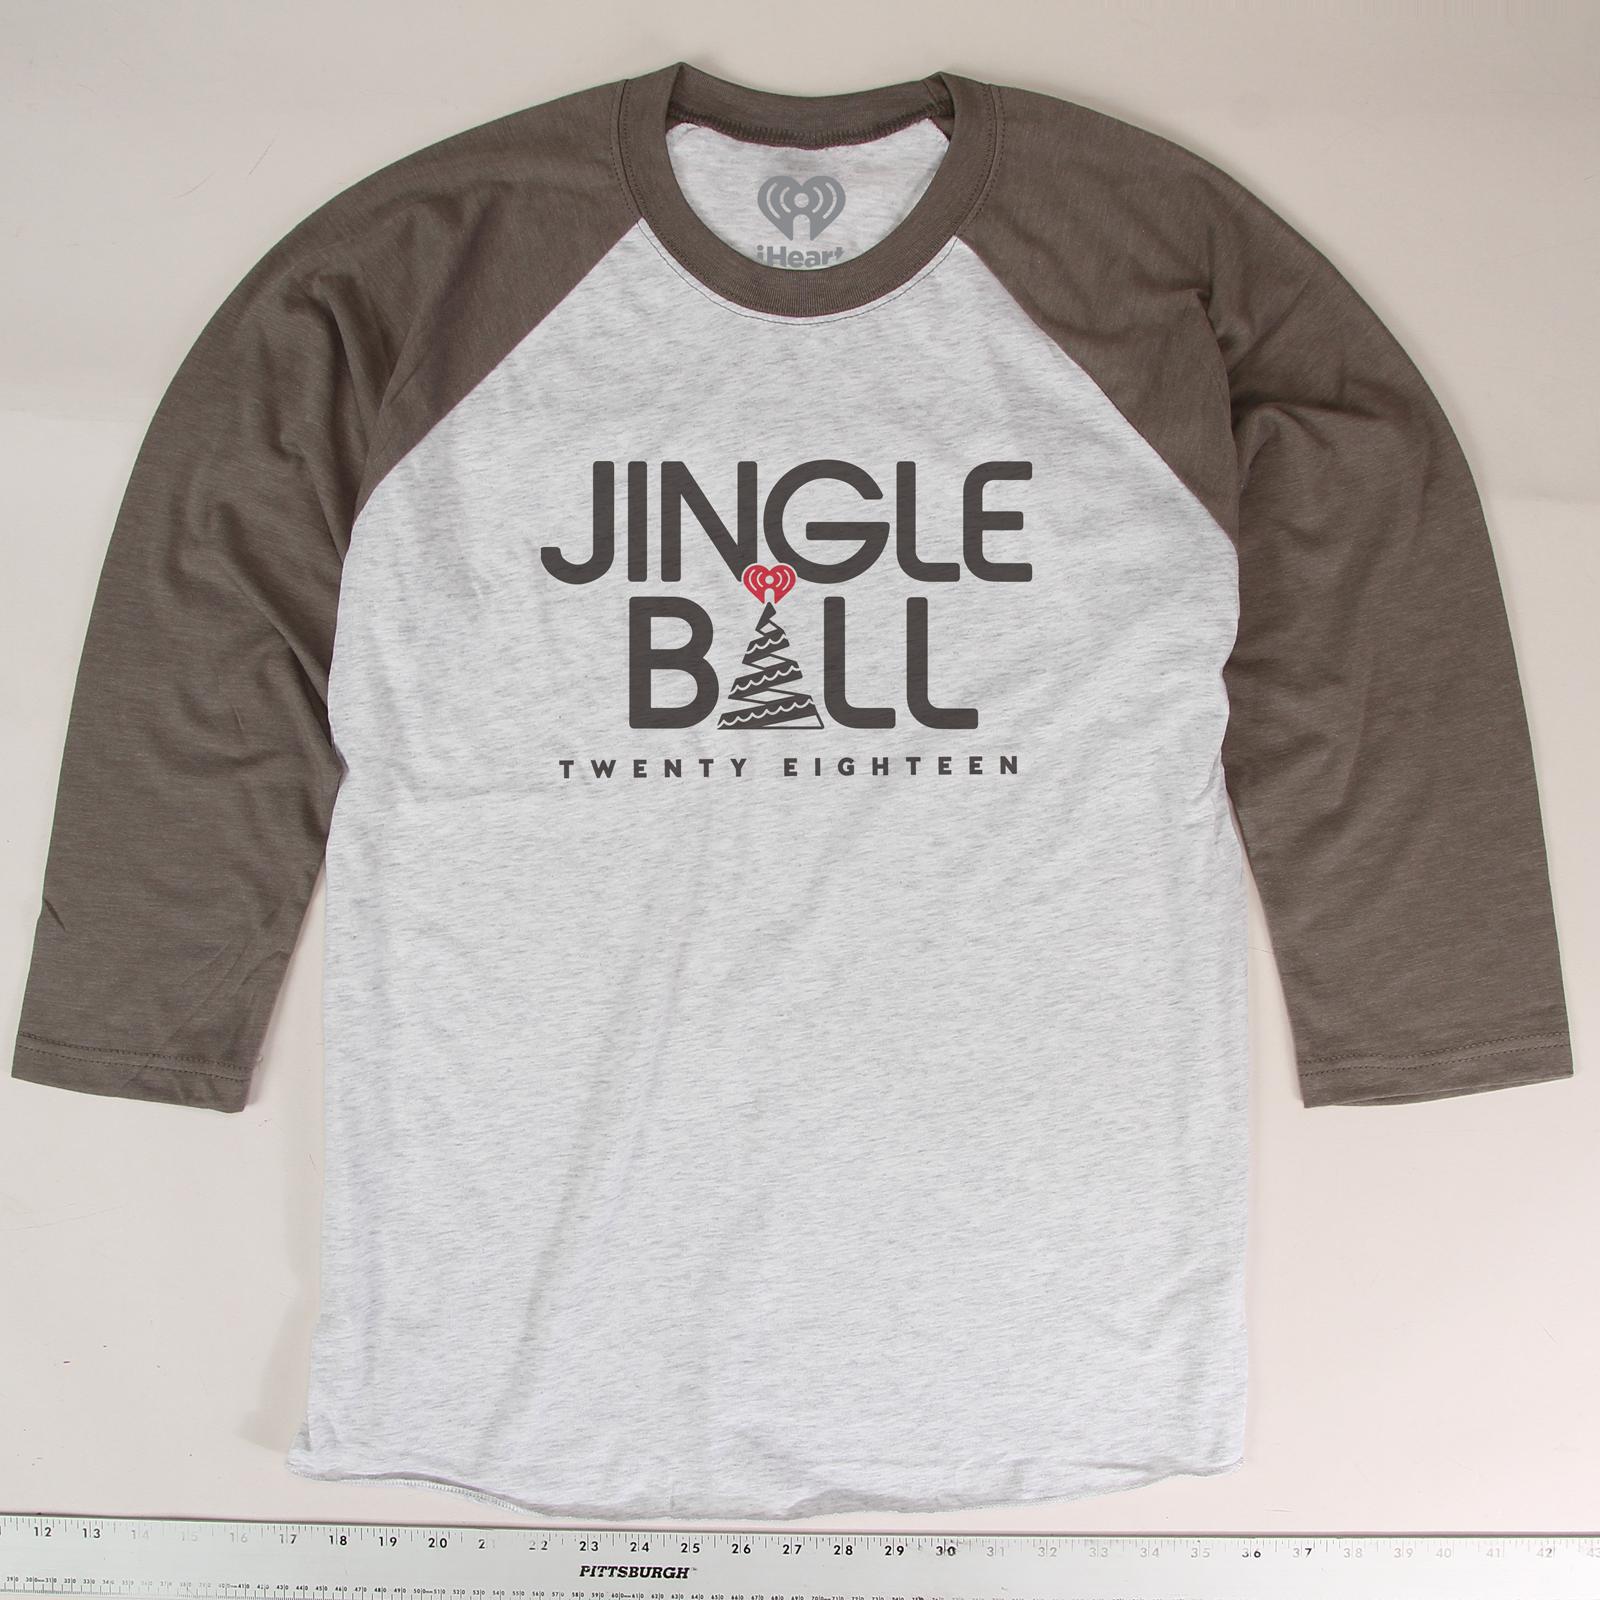 2018 Jingle Ball Tour Baseball Tee